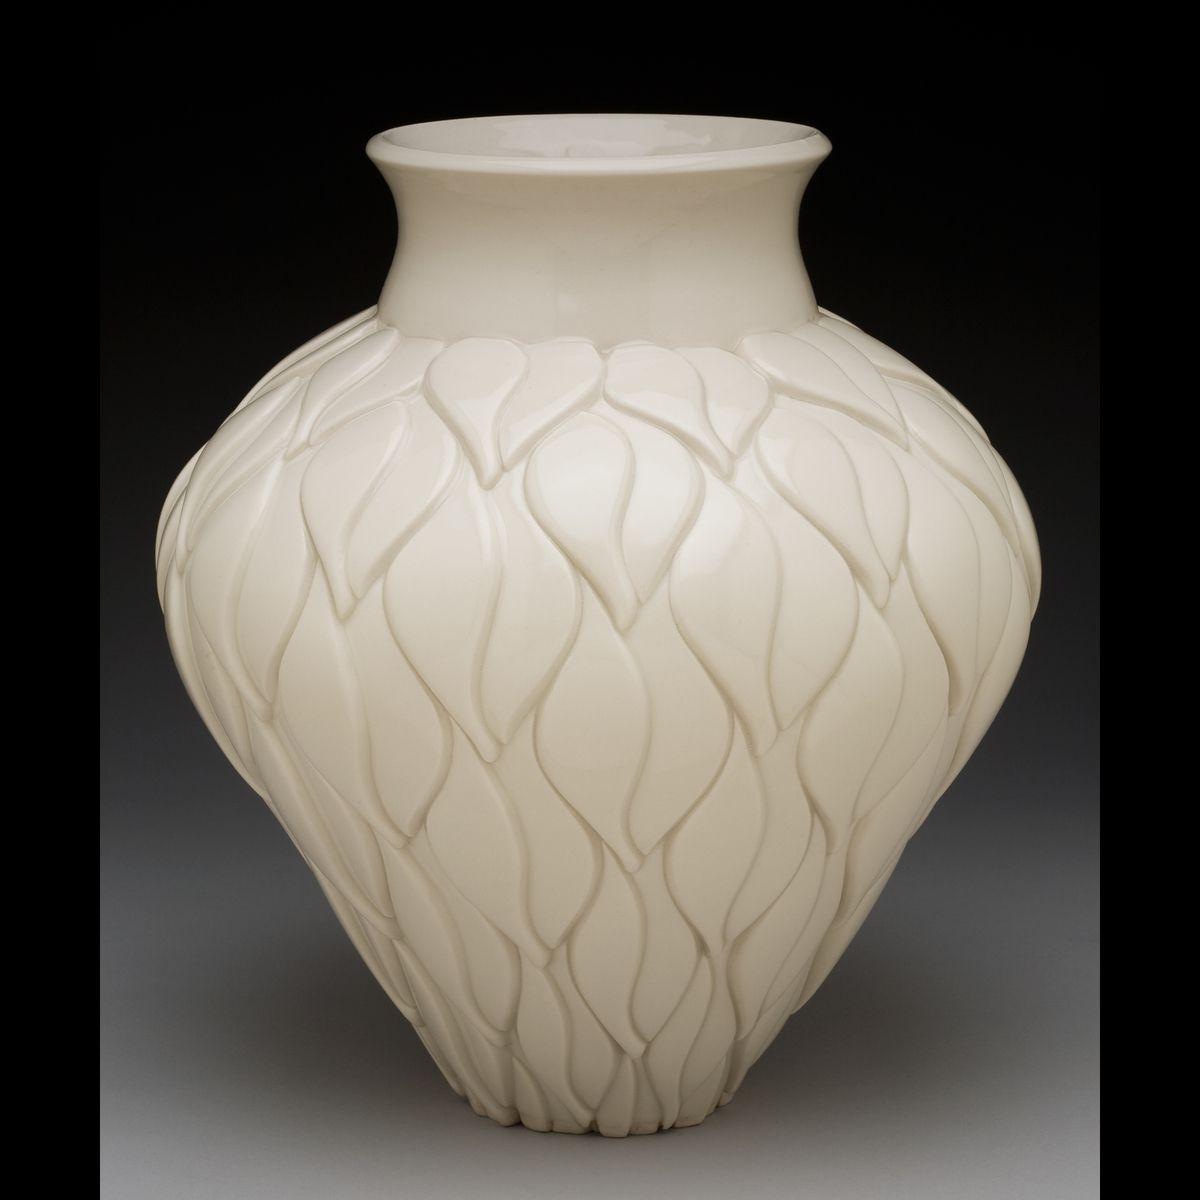 hand made porcelain ceramic vase by lynne meade porcelain  - leaf motif vase porcelain ceramic vase by lynne meade